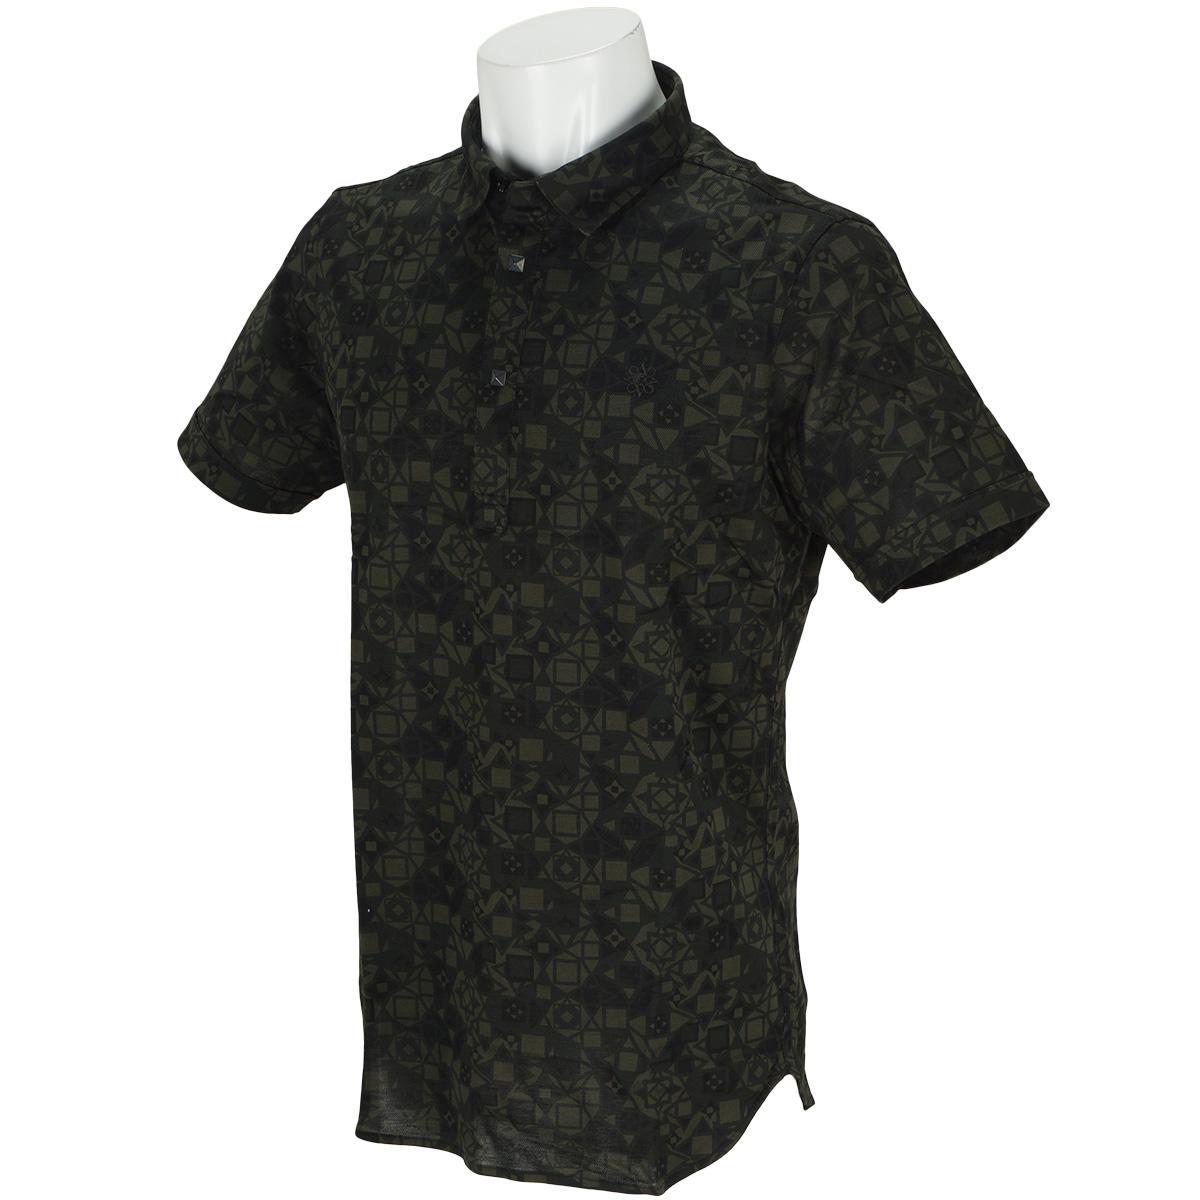 BK アンドリュースカモ柄鹿の子半袖ポロシャツ